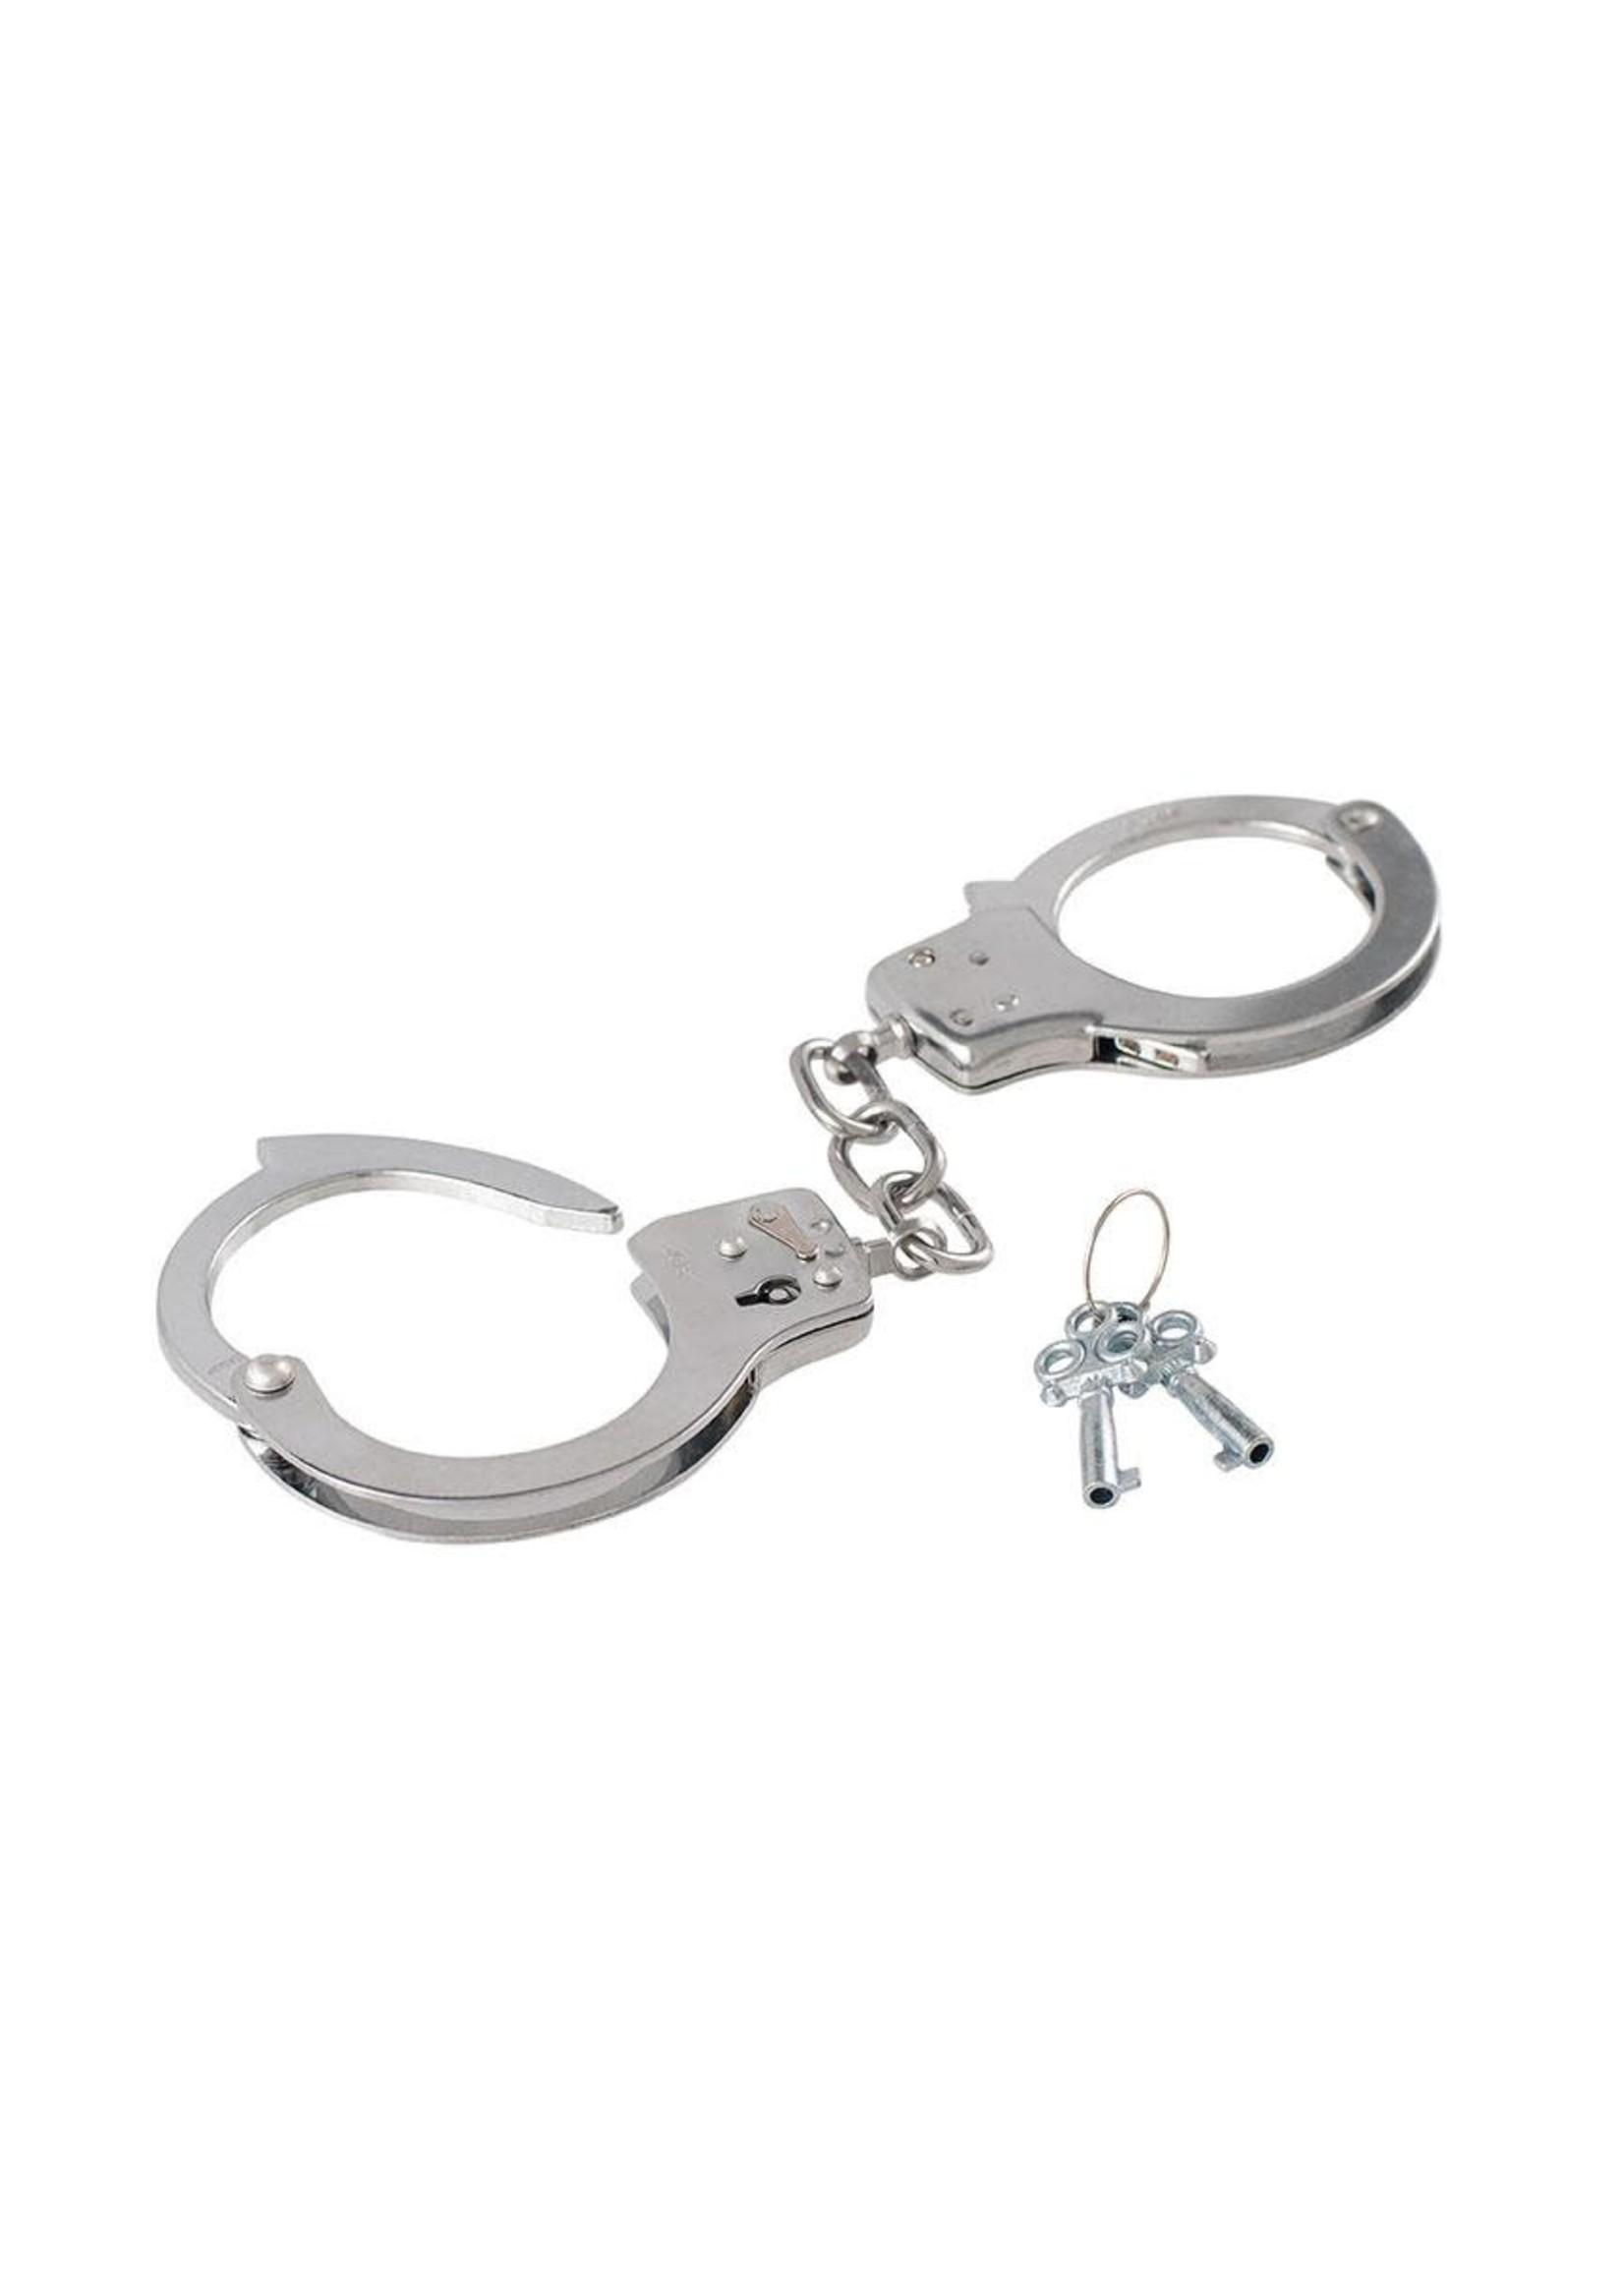 Si Single Lock Handcuffs